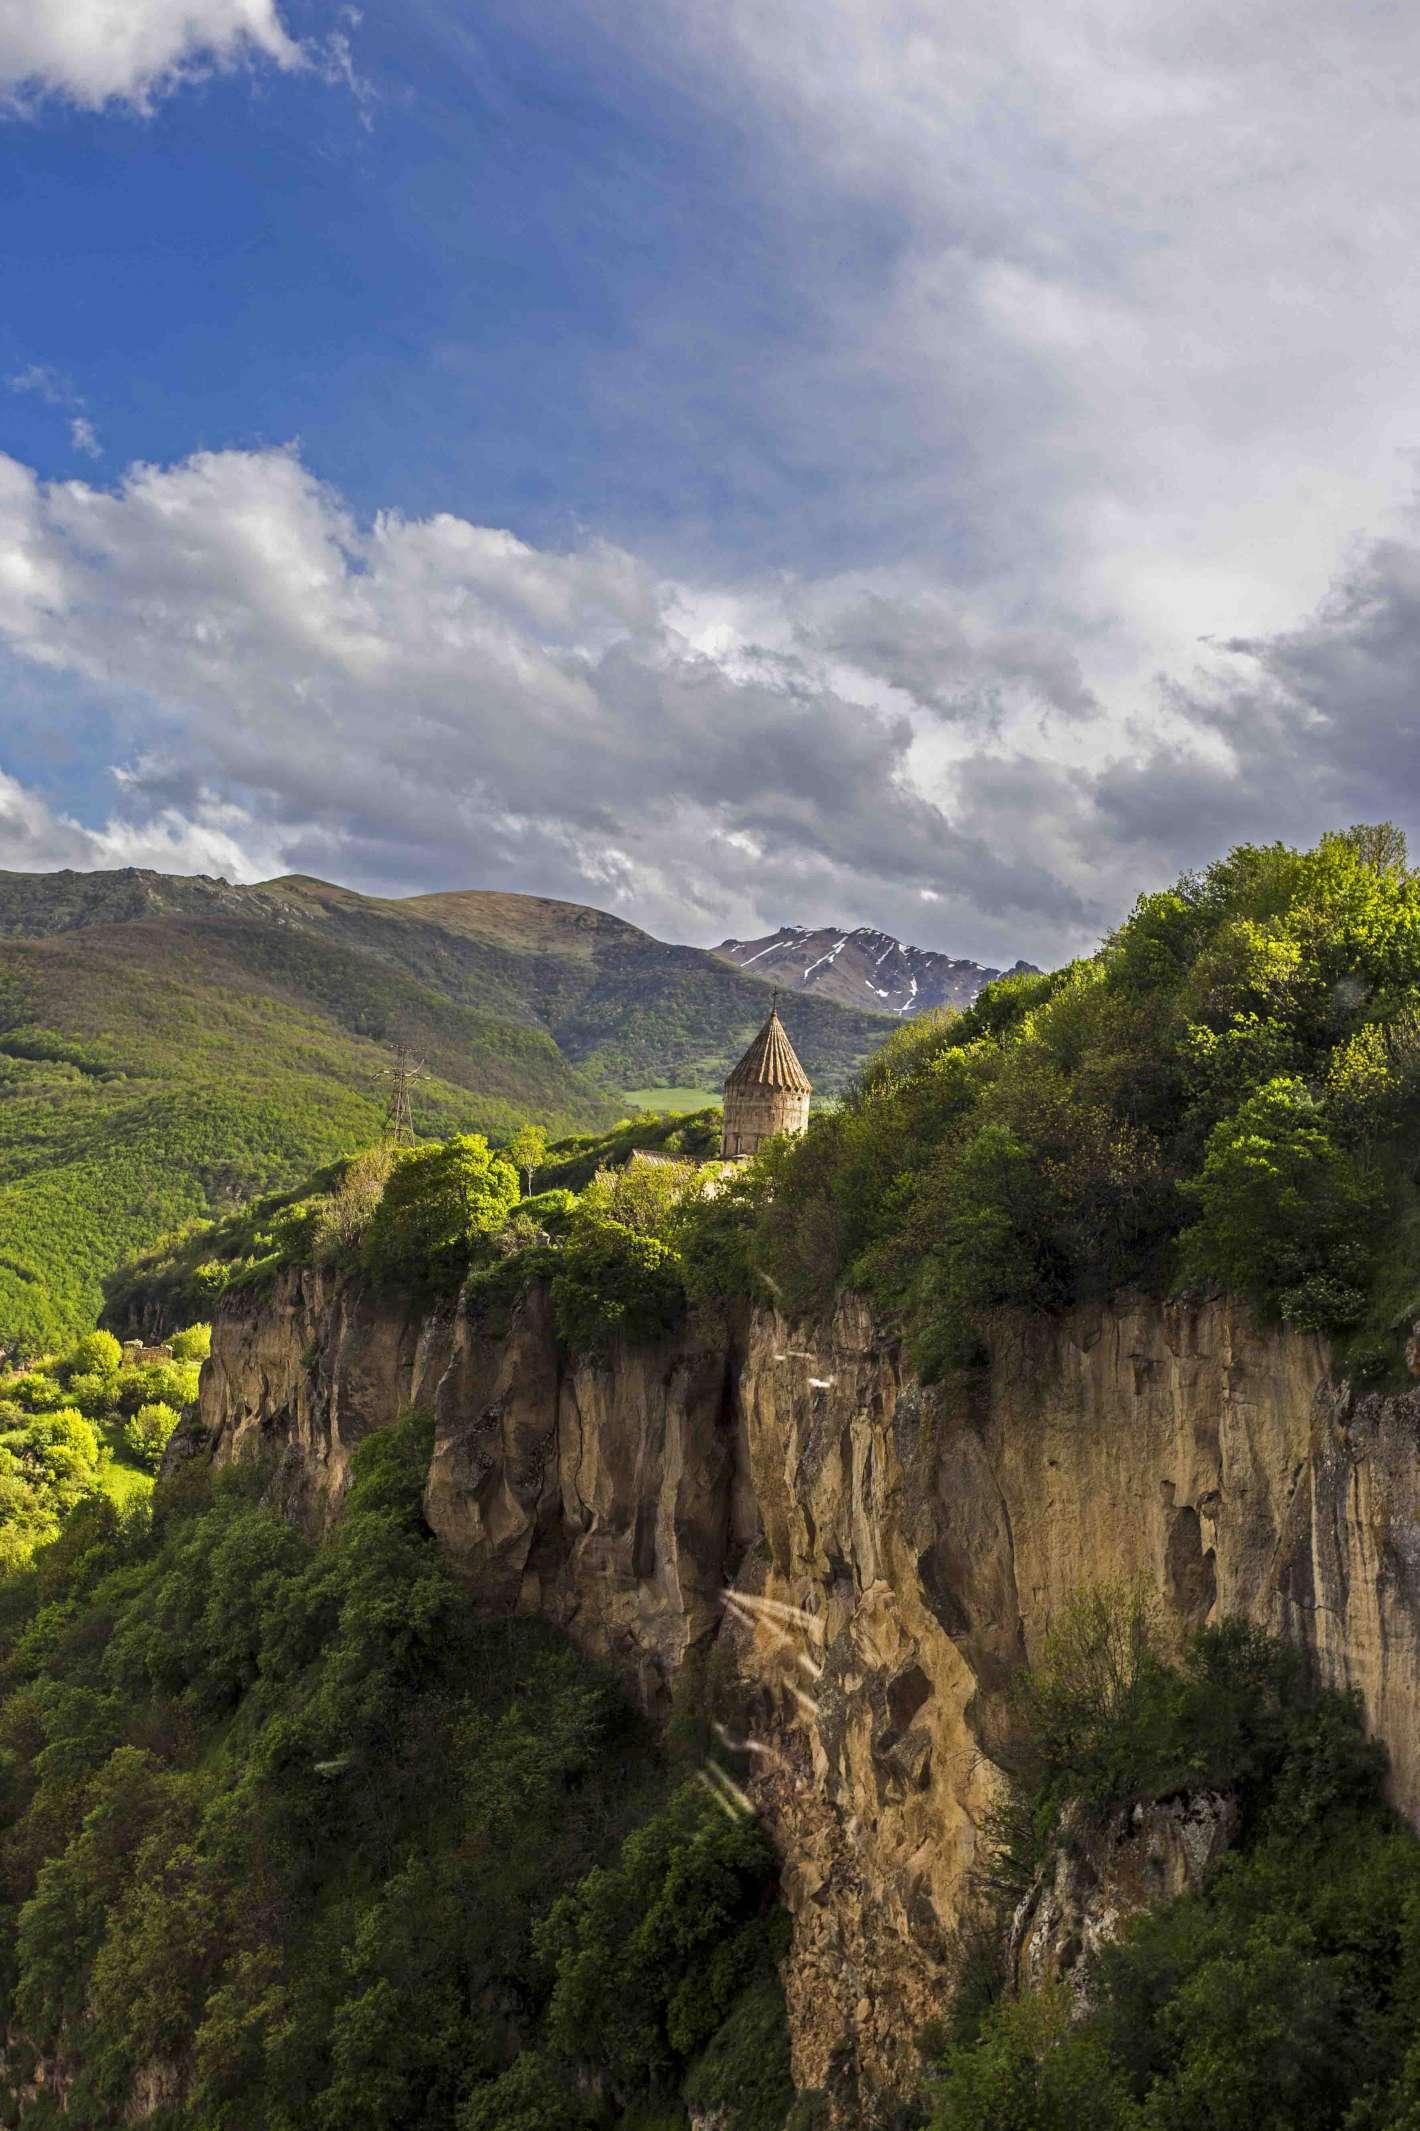 Kalnų Karabachas | Alkas.lt, A. Sartanavičiaus nuotr.